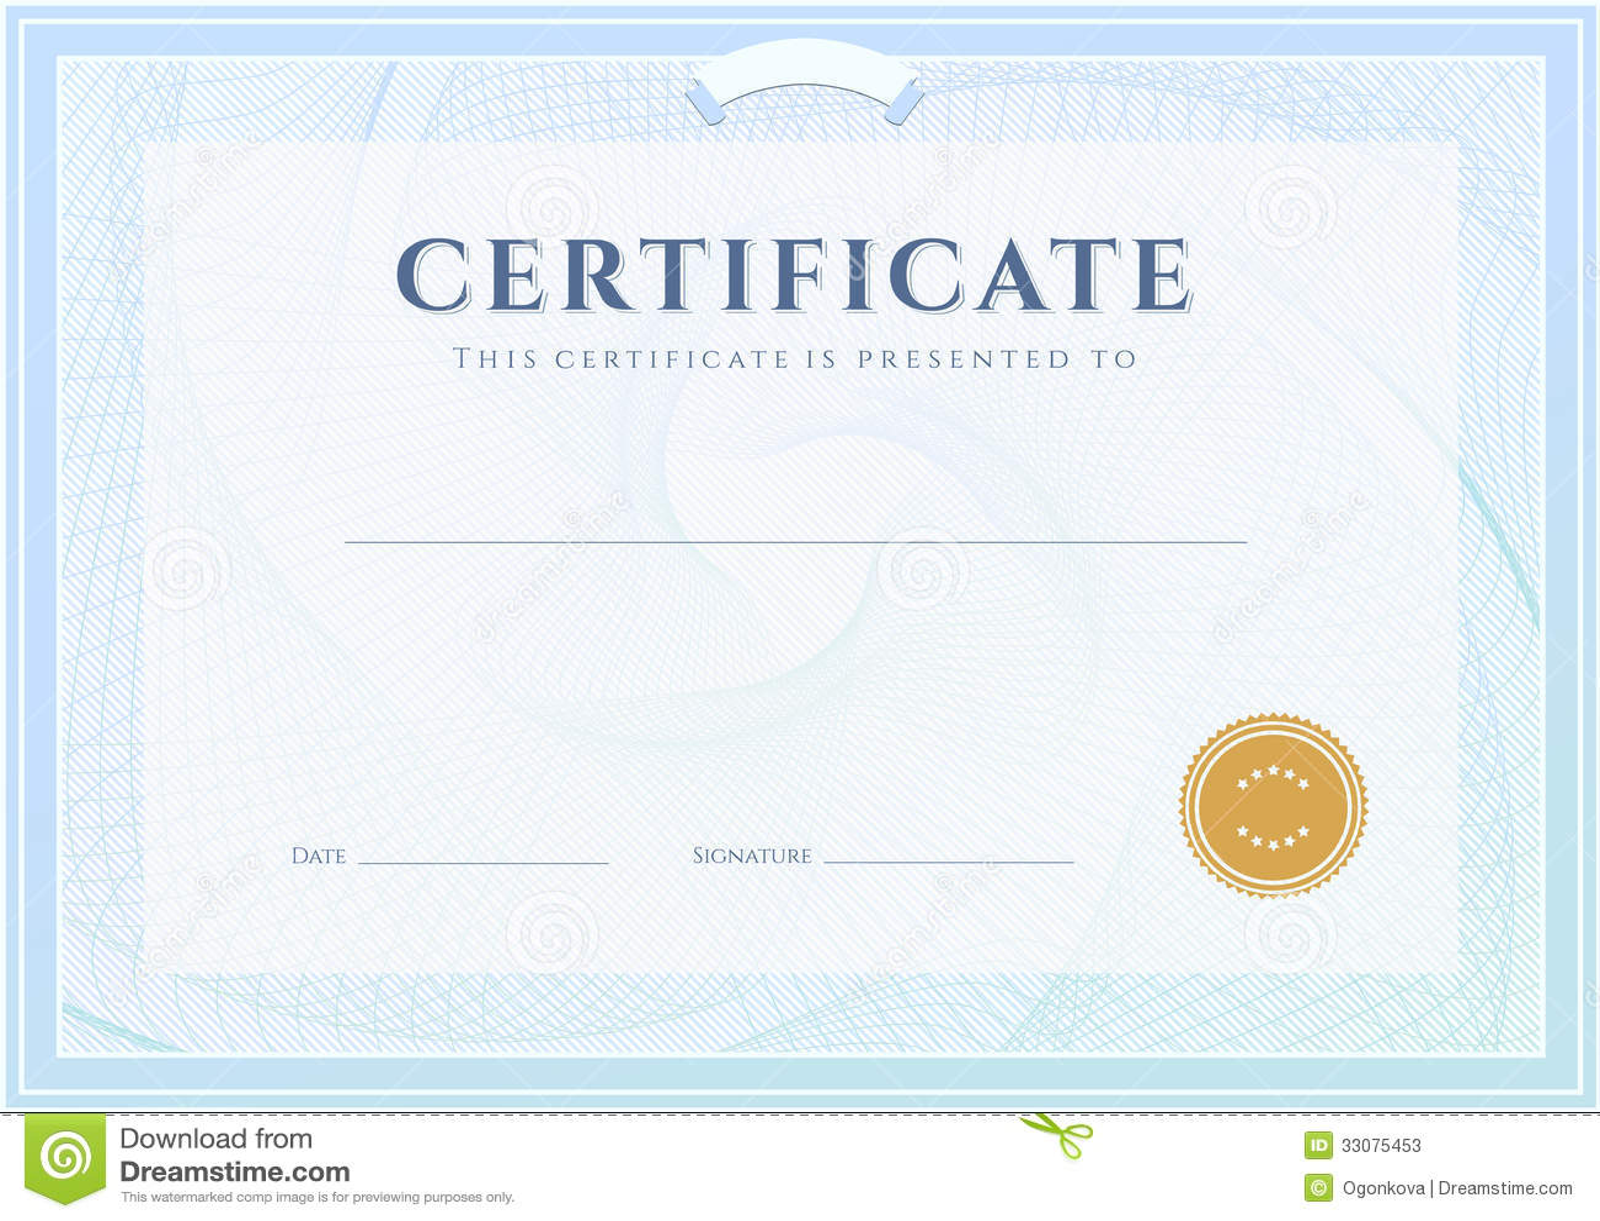 Certificate of achievement word template hatchurbanskript certificate yelopaper Gallery